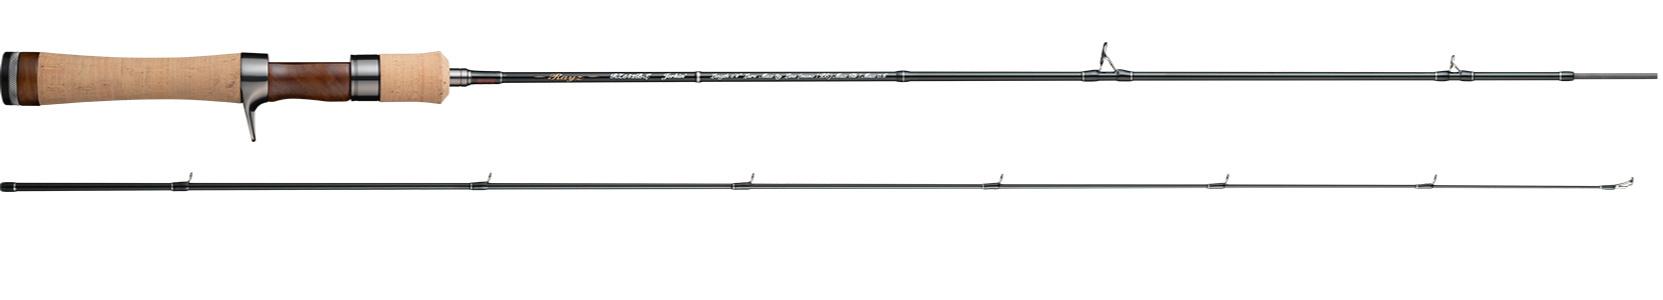 RZ542B-L baitcaster